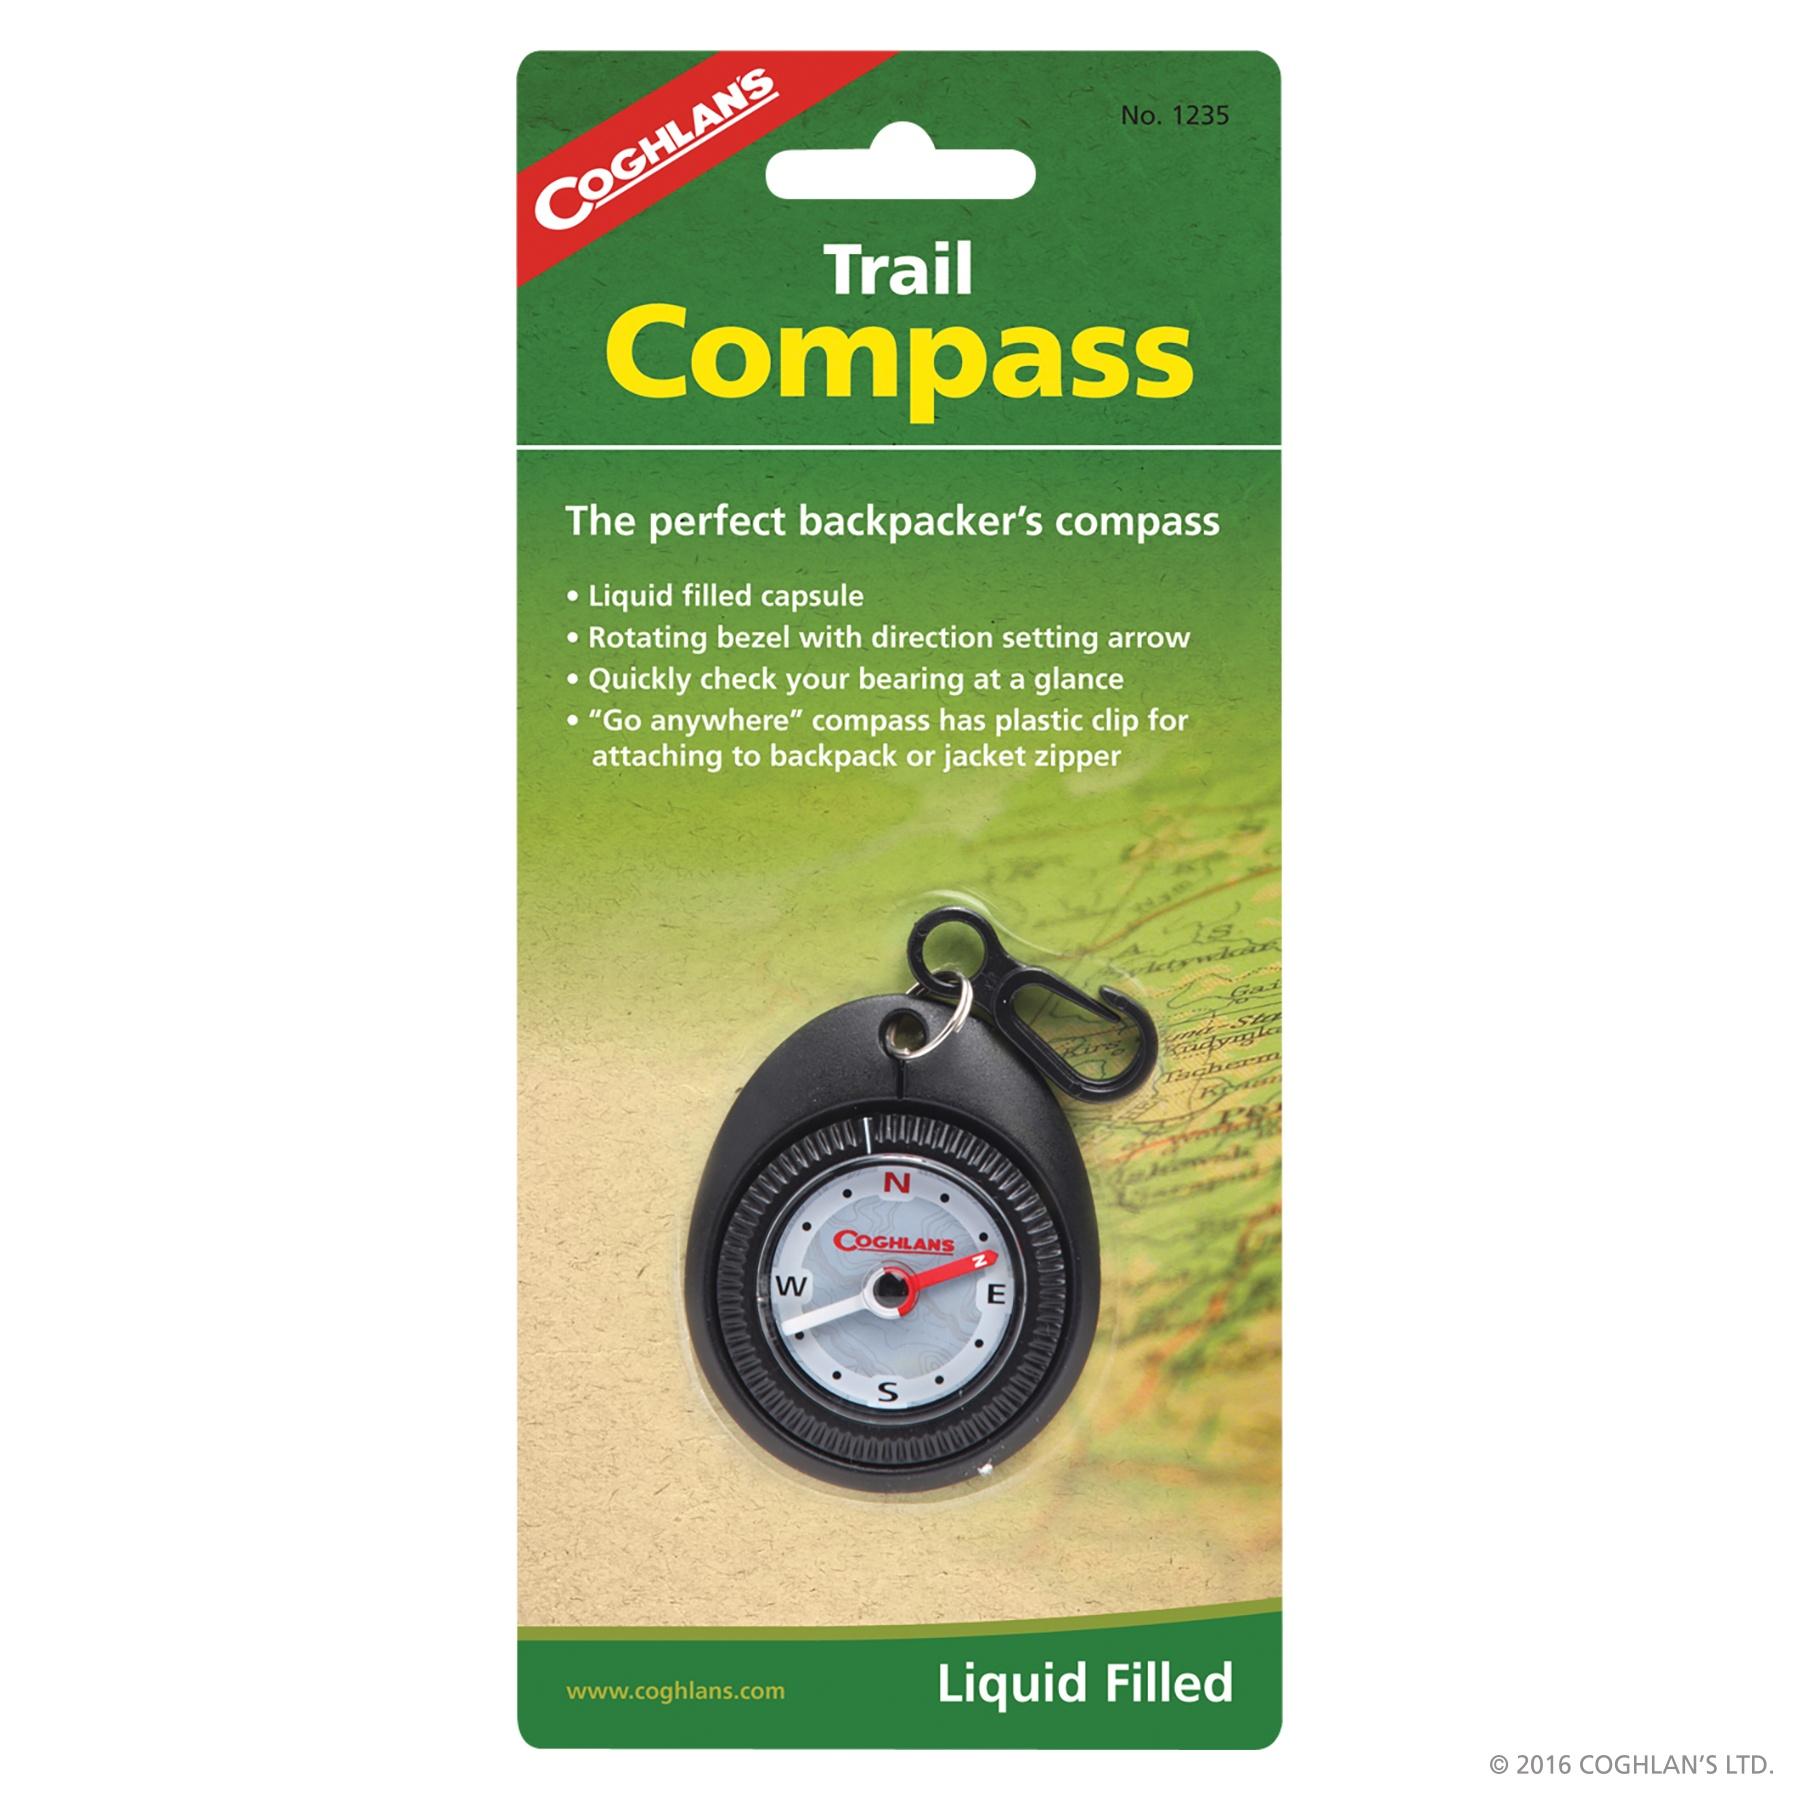 Trail Compass